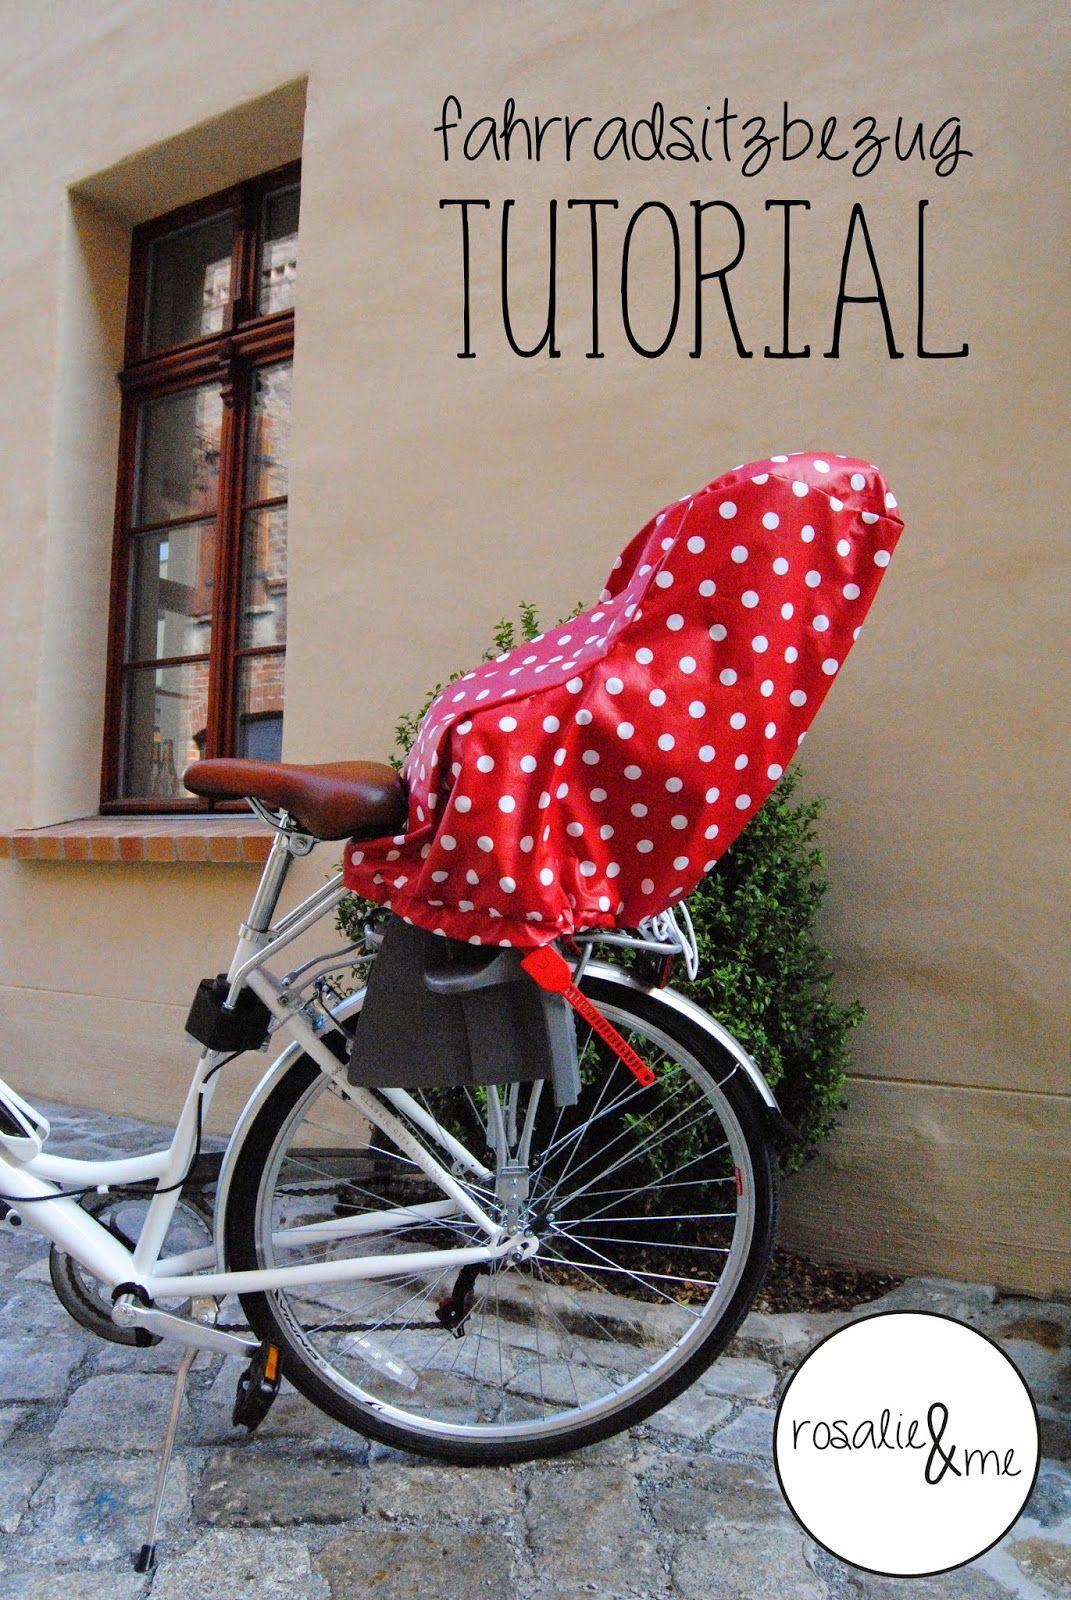 rosalie me schnitt f r schnitt 1 einen fahrradsitzbezug. Black Bedroom Furniture Sets. Home Design Ideas